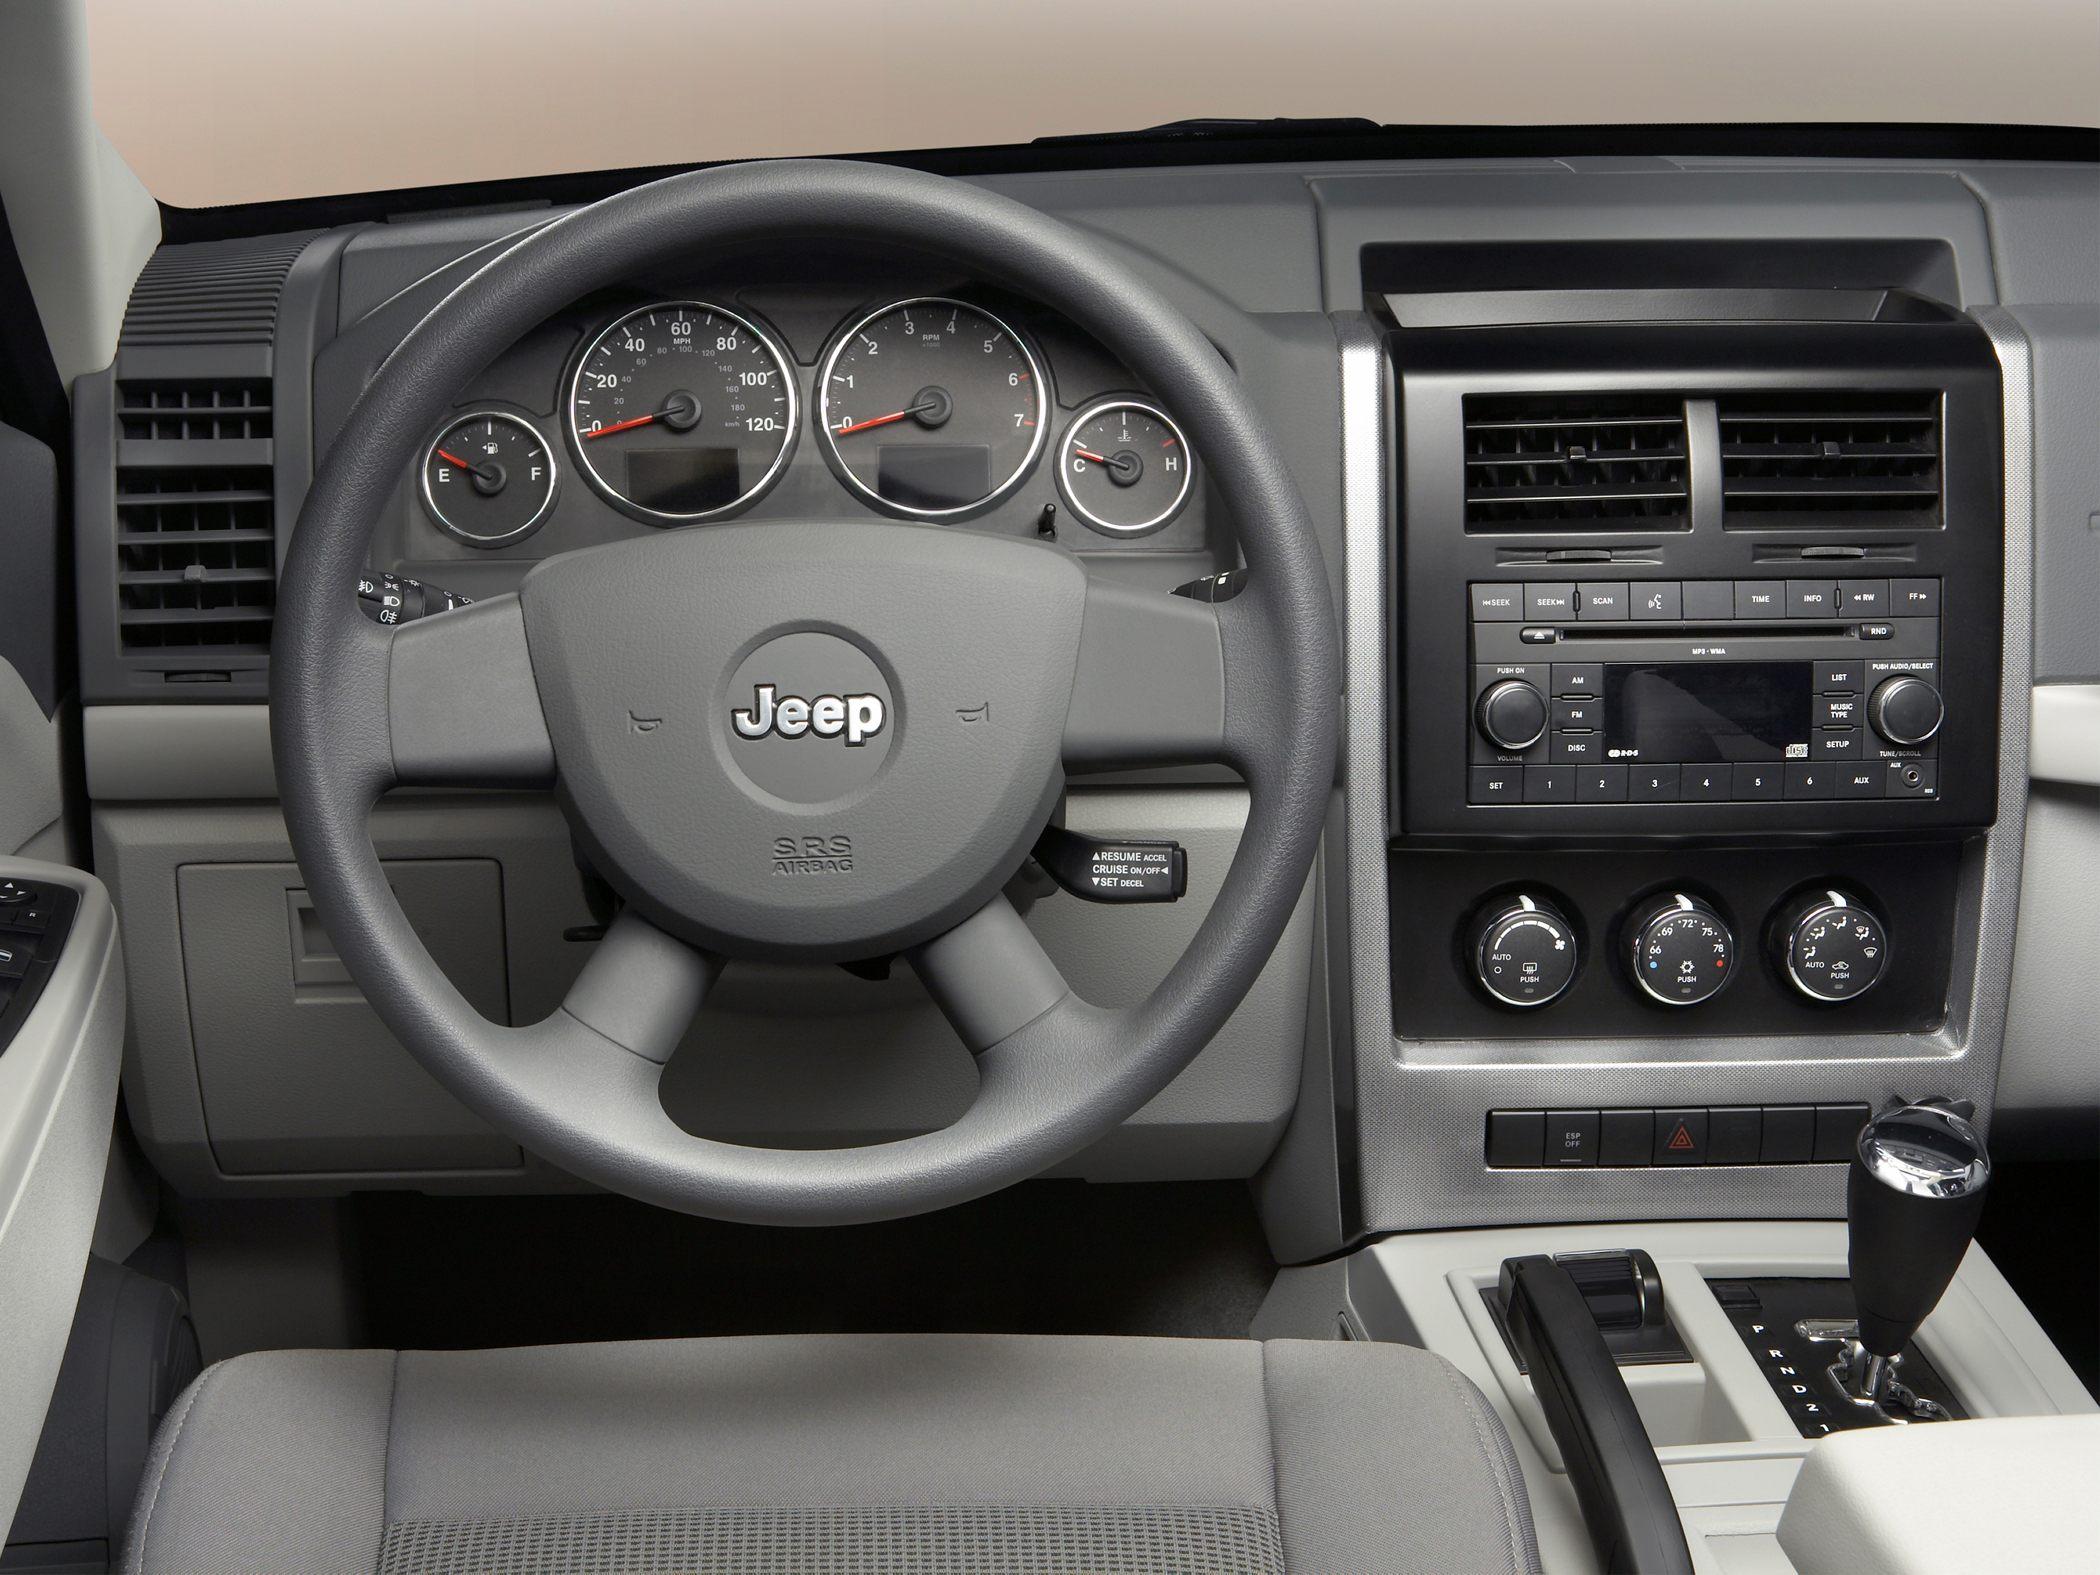 2010 jeep liberty - image #17